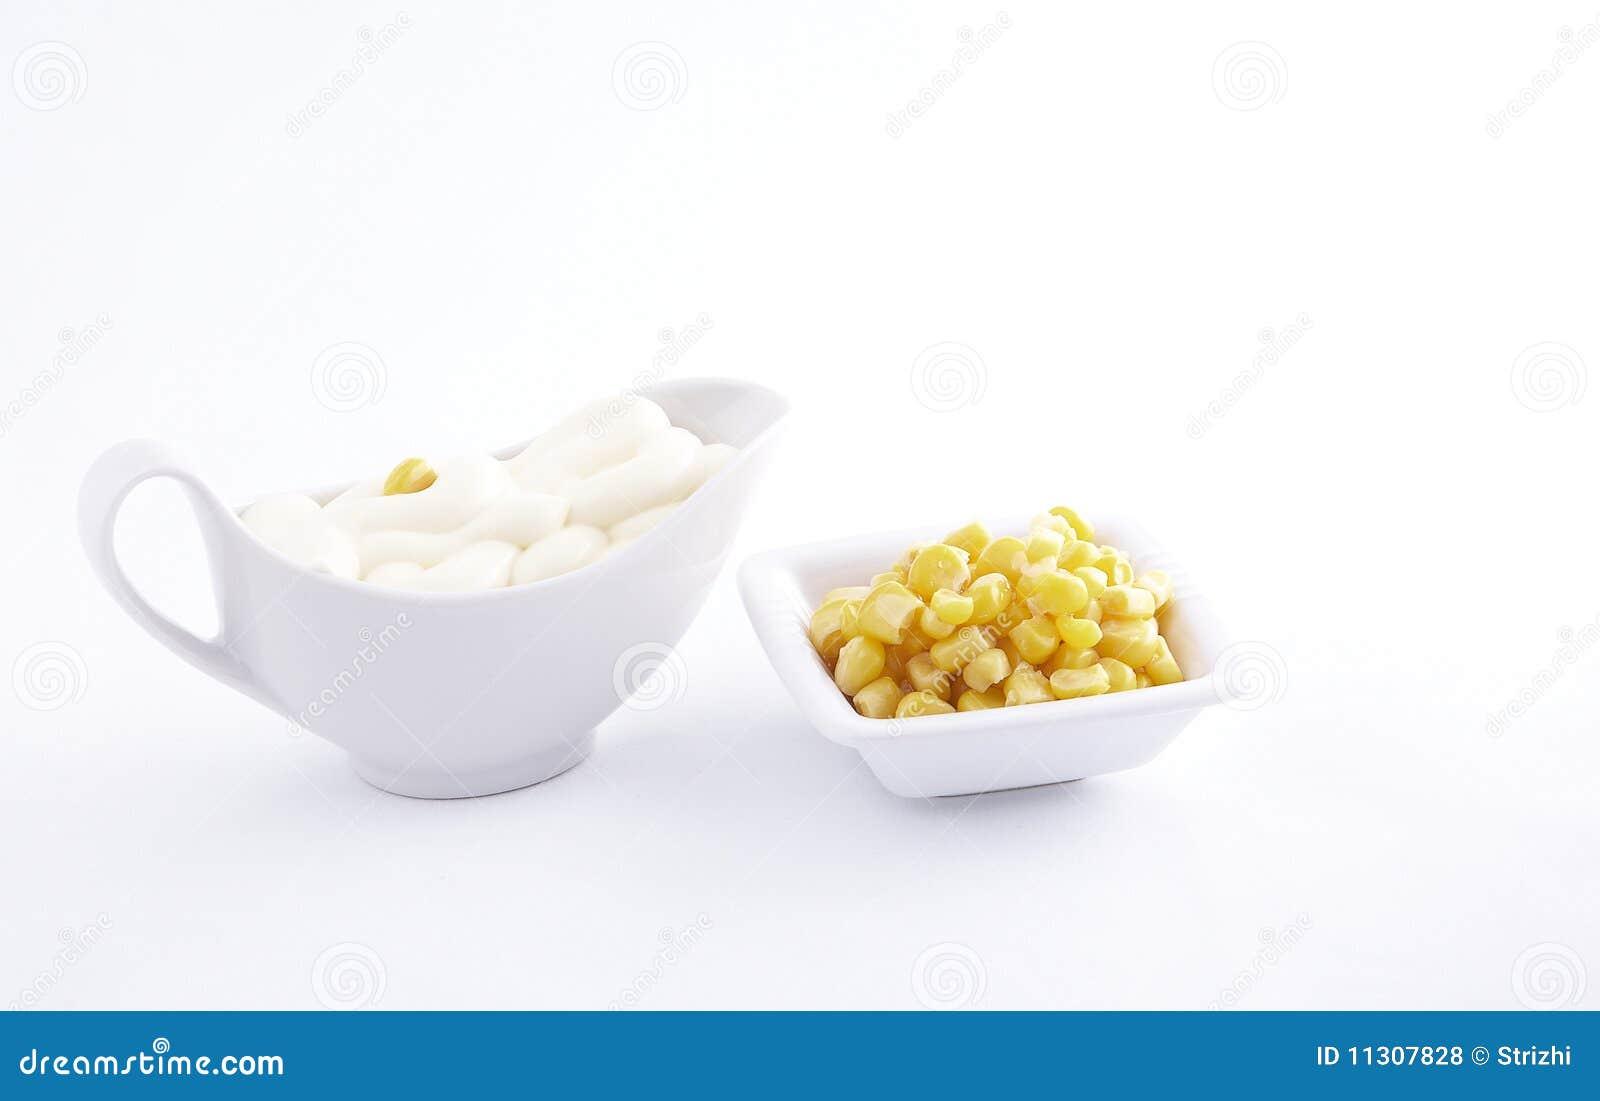 Majonäse und Mais